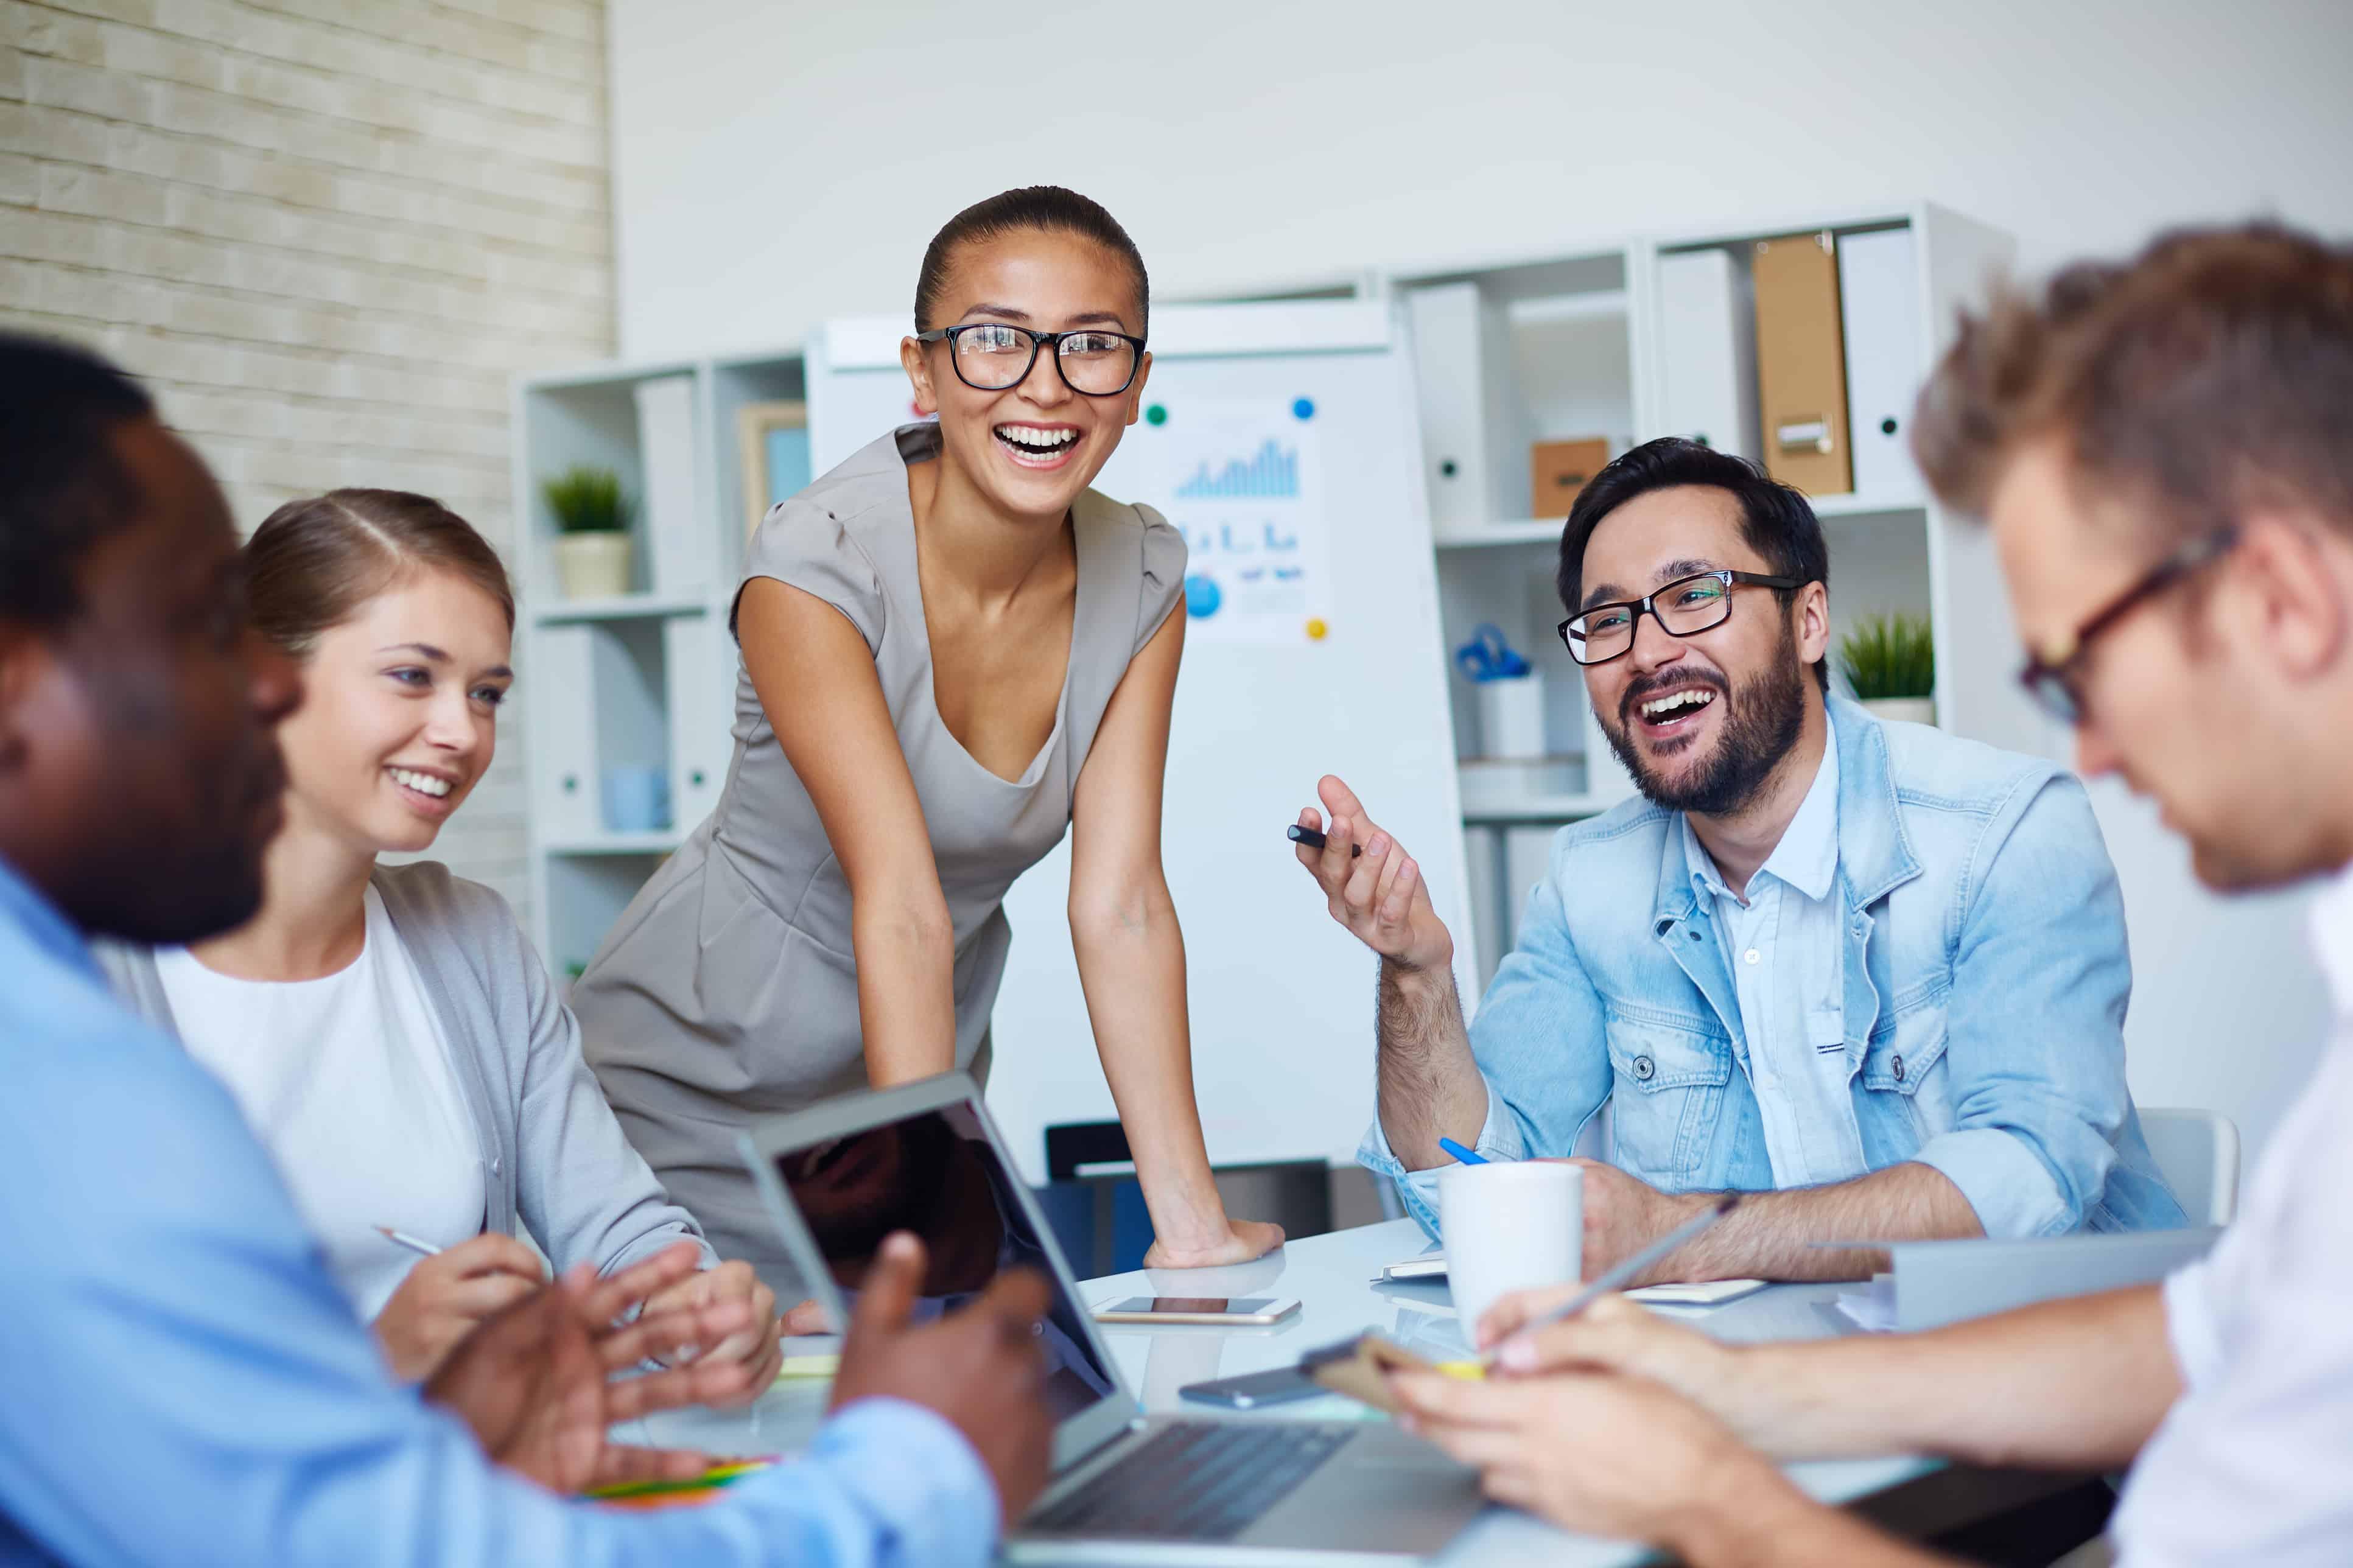 Joyful colleagues planning work at briefing